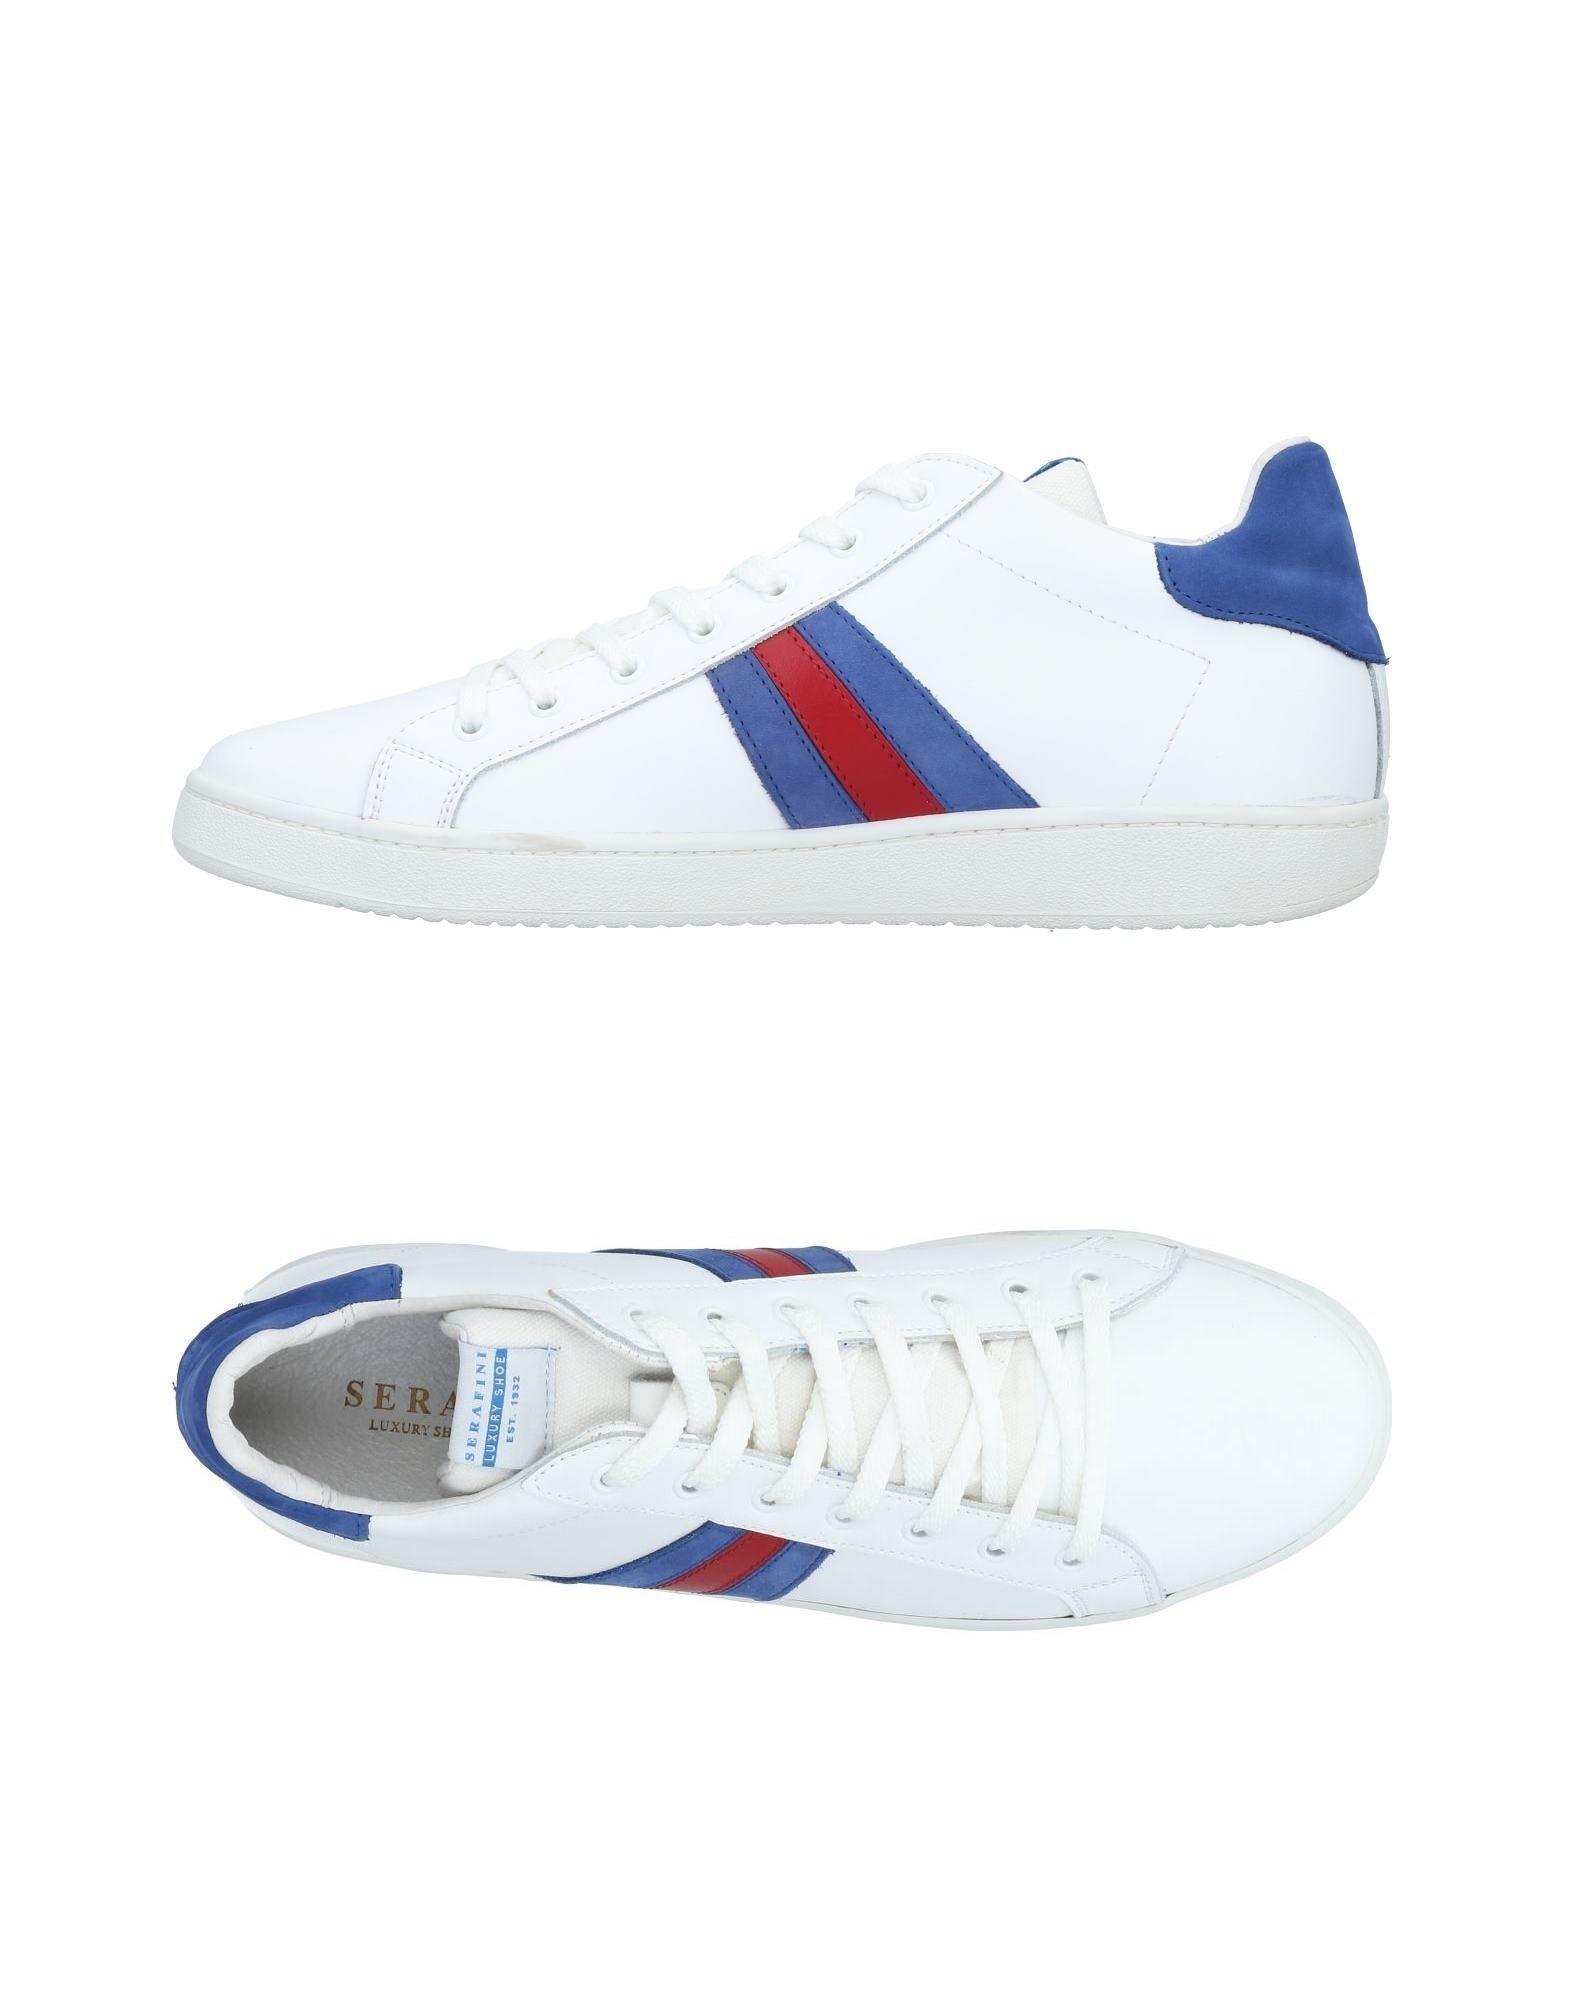 Serafini Luxury White Leather Sneakers